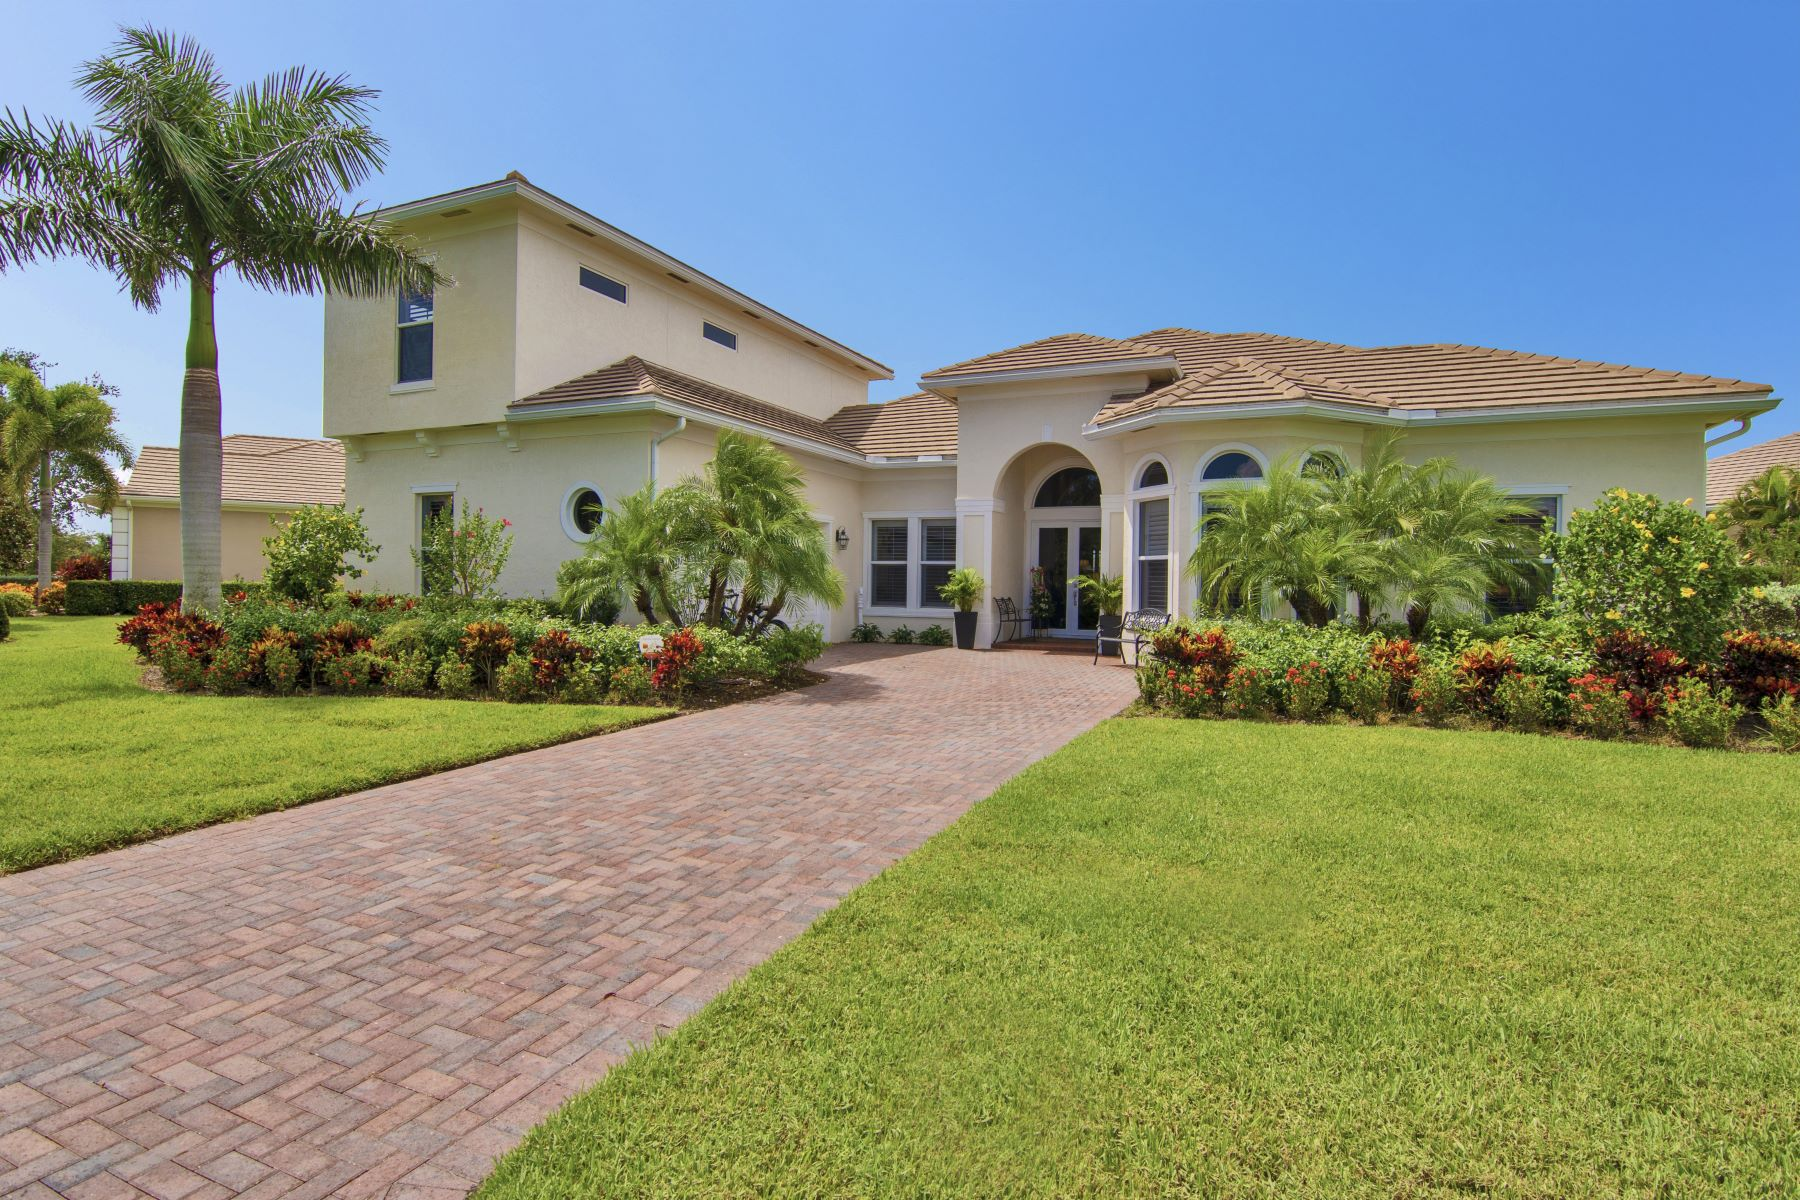 Single Family Homes για την Πώληση στο 1070 River Wind Circle, Vero Beach, FL 1070 River Wind Circle Vero Beach, Φλοριντα 32967 Ηνωμένες Πολιτείες